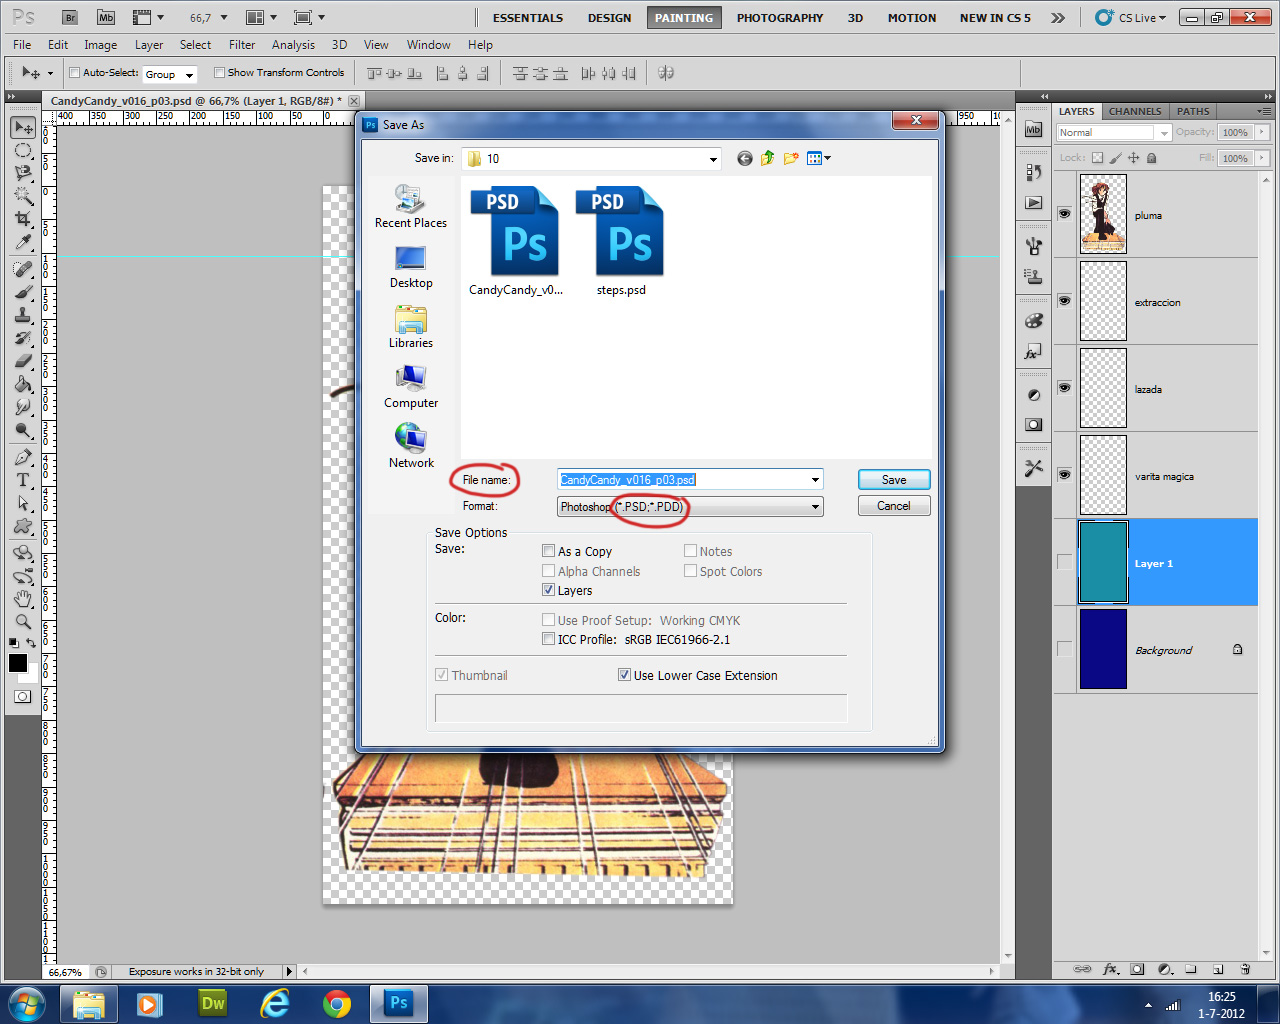 Adobe Systems Incorporated Creative Suite Design And Web Premium Cs